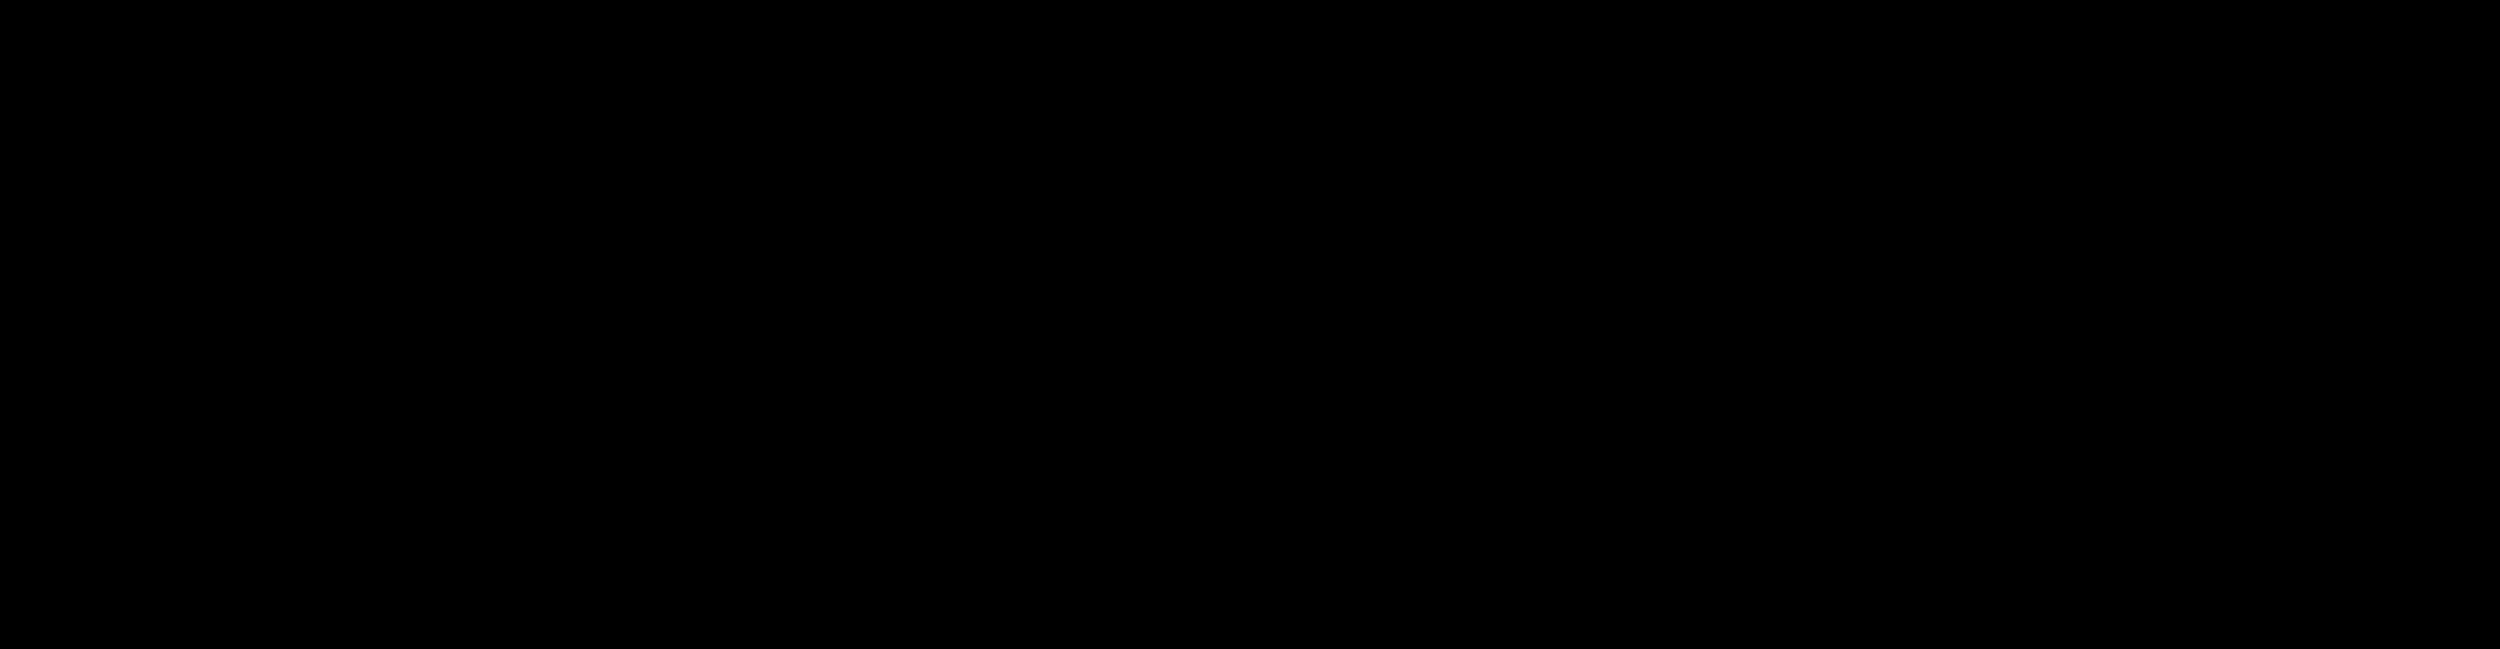 logo-banorte-negro-01.png